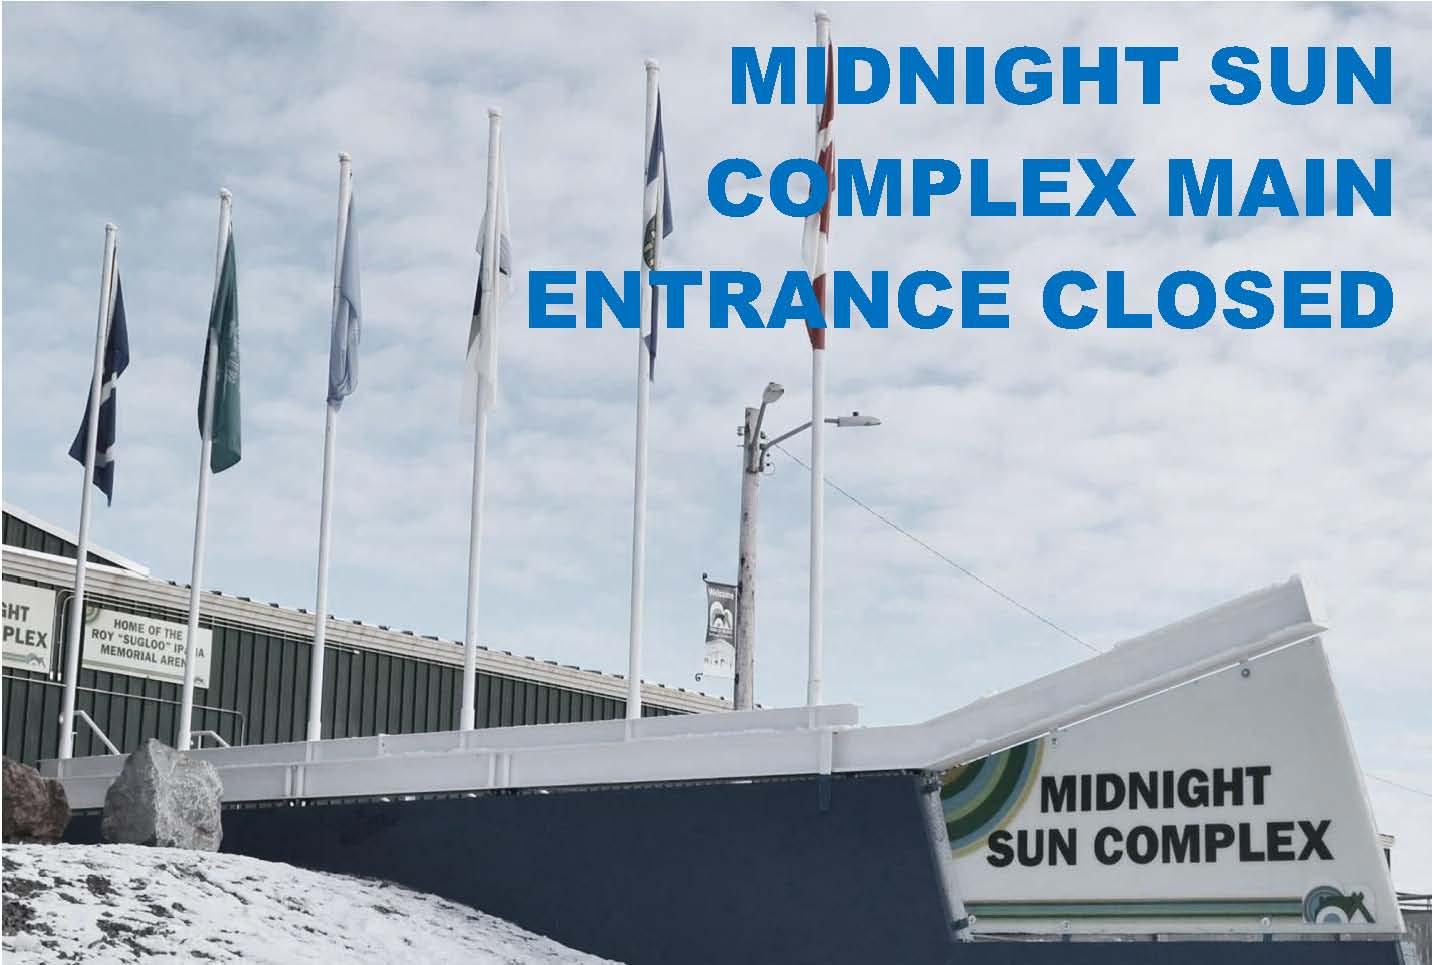 MSC Front Entrance Closed